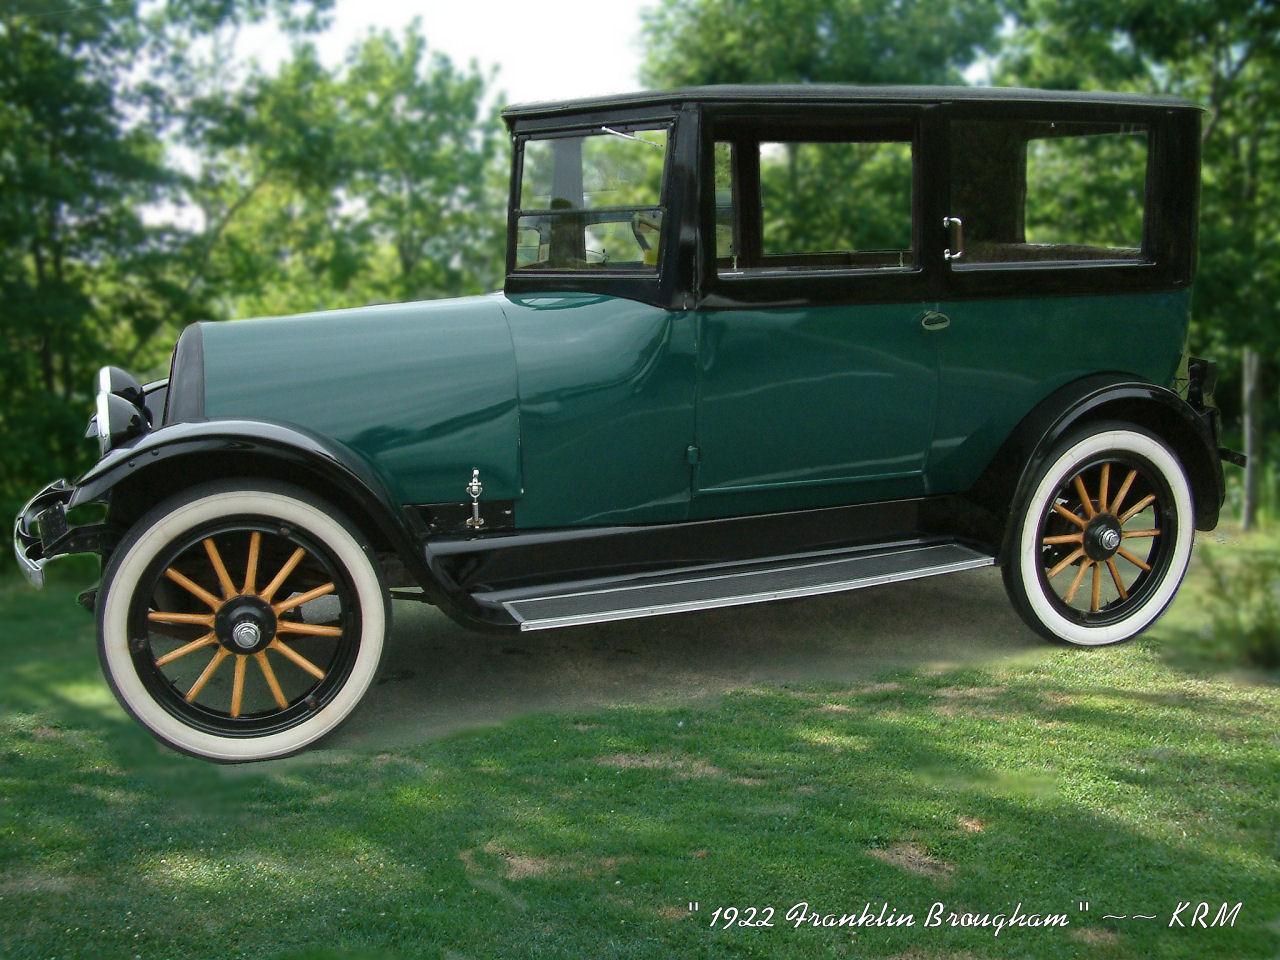 1922 Franklin Brougham